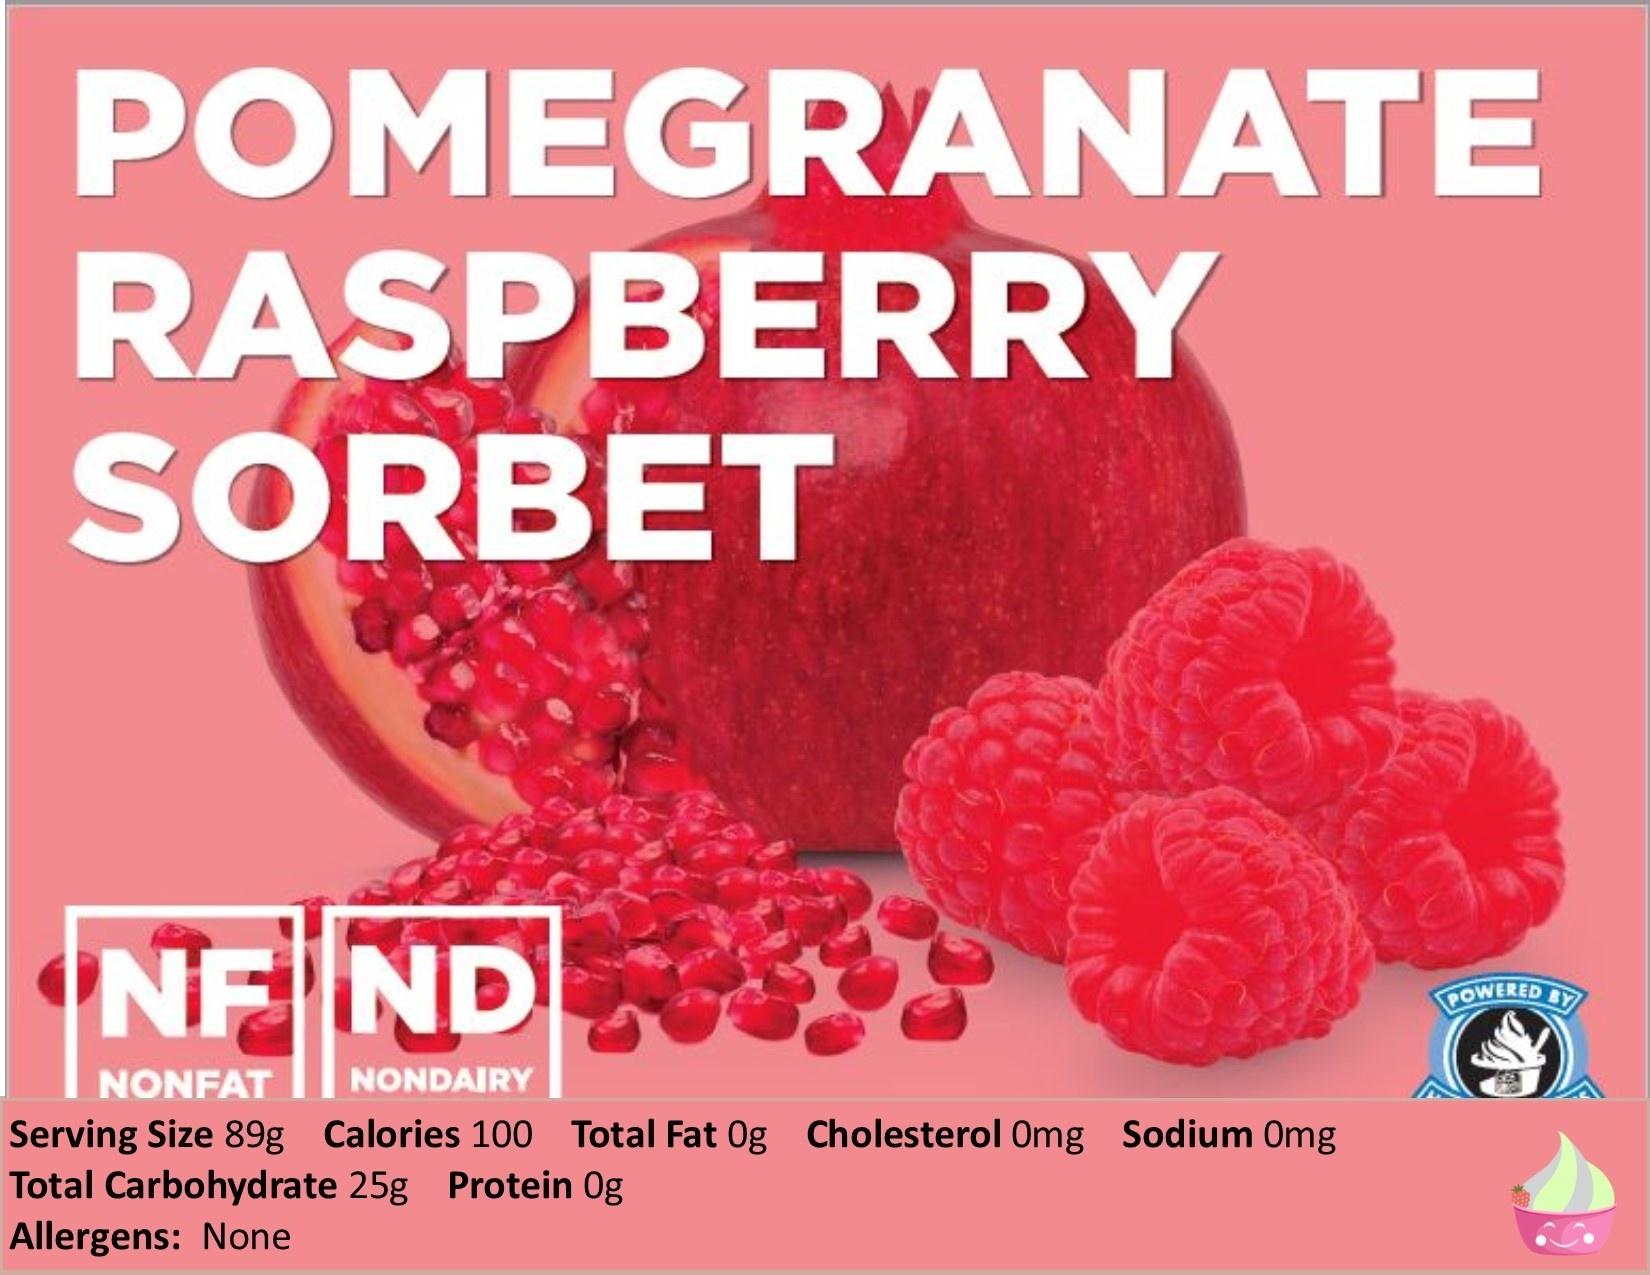 https://0201.nccdn.net/1_2/000/000/140/0f9/Pomegranate-Raspberry-sorbet-NF-1650x1275-1650x1275.jpg